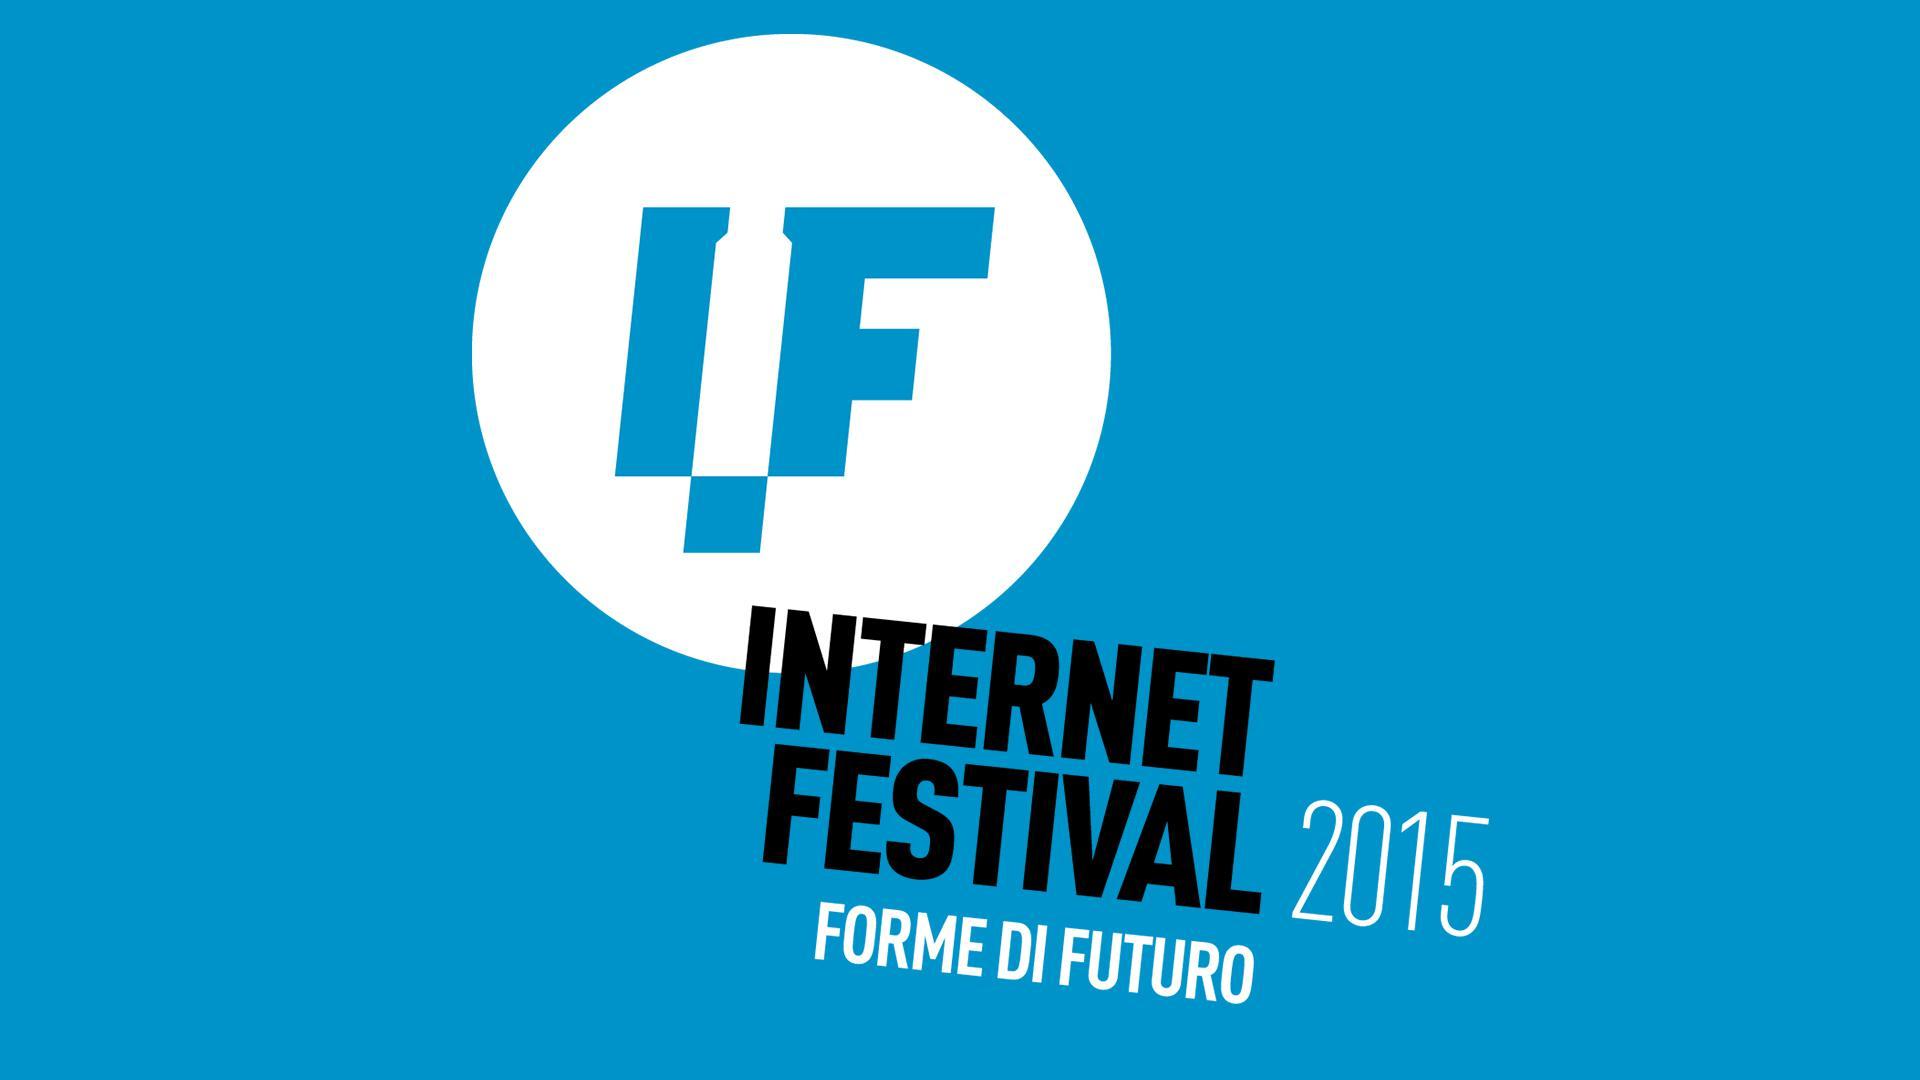 Une App innovante pour un Festival innovant